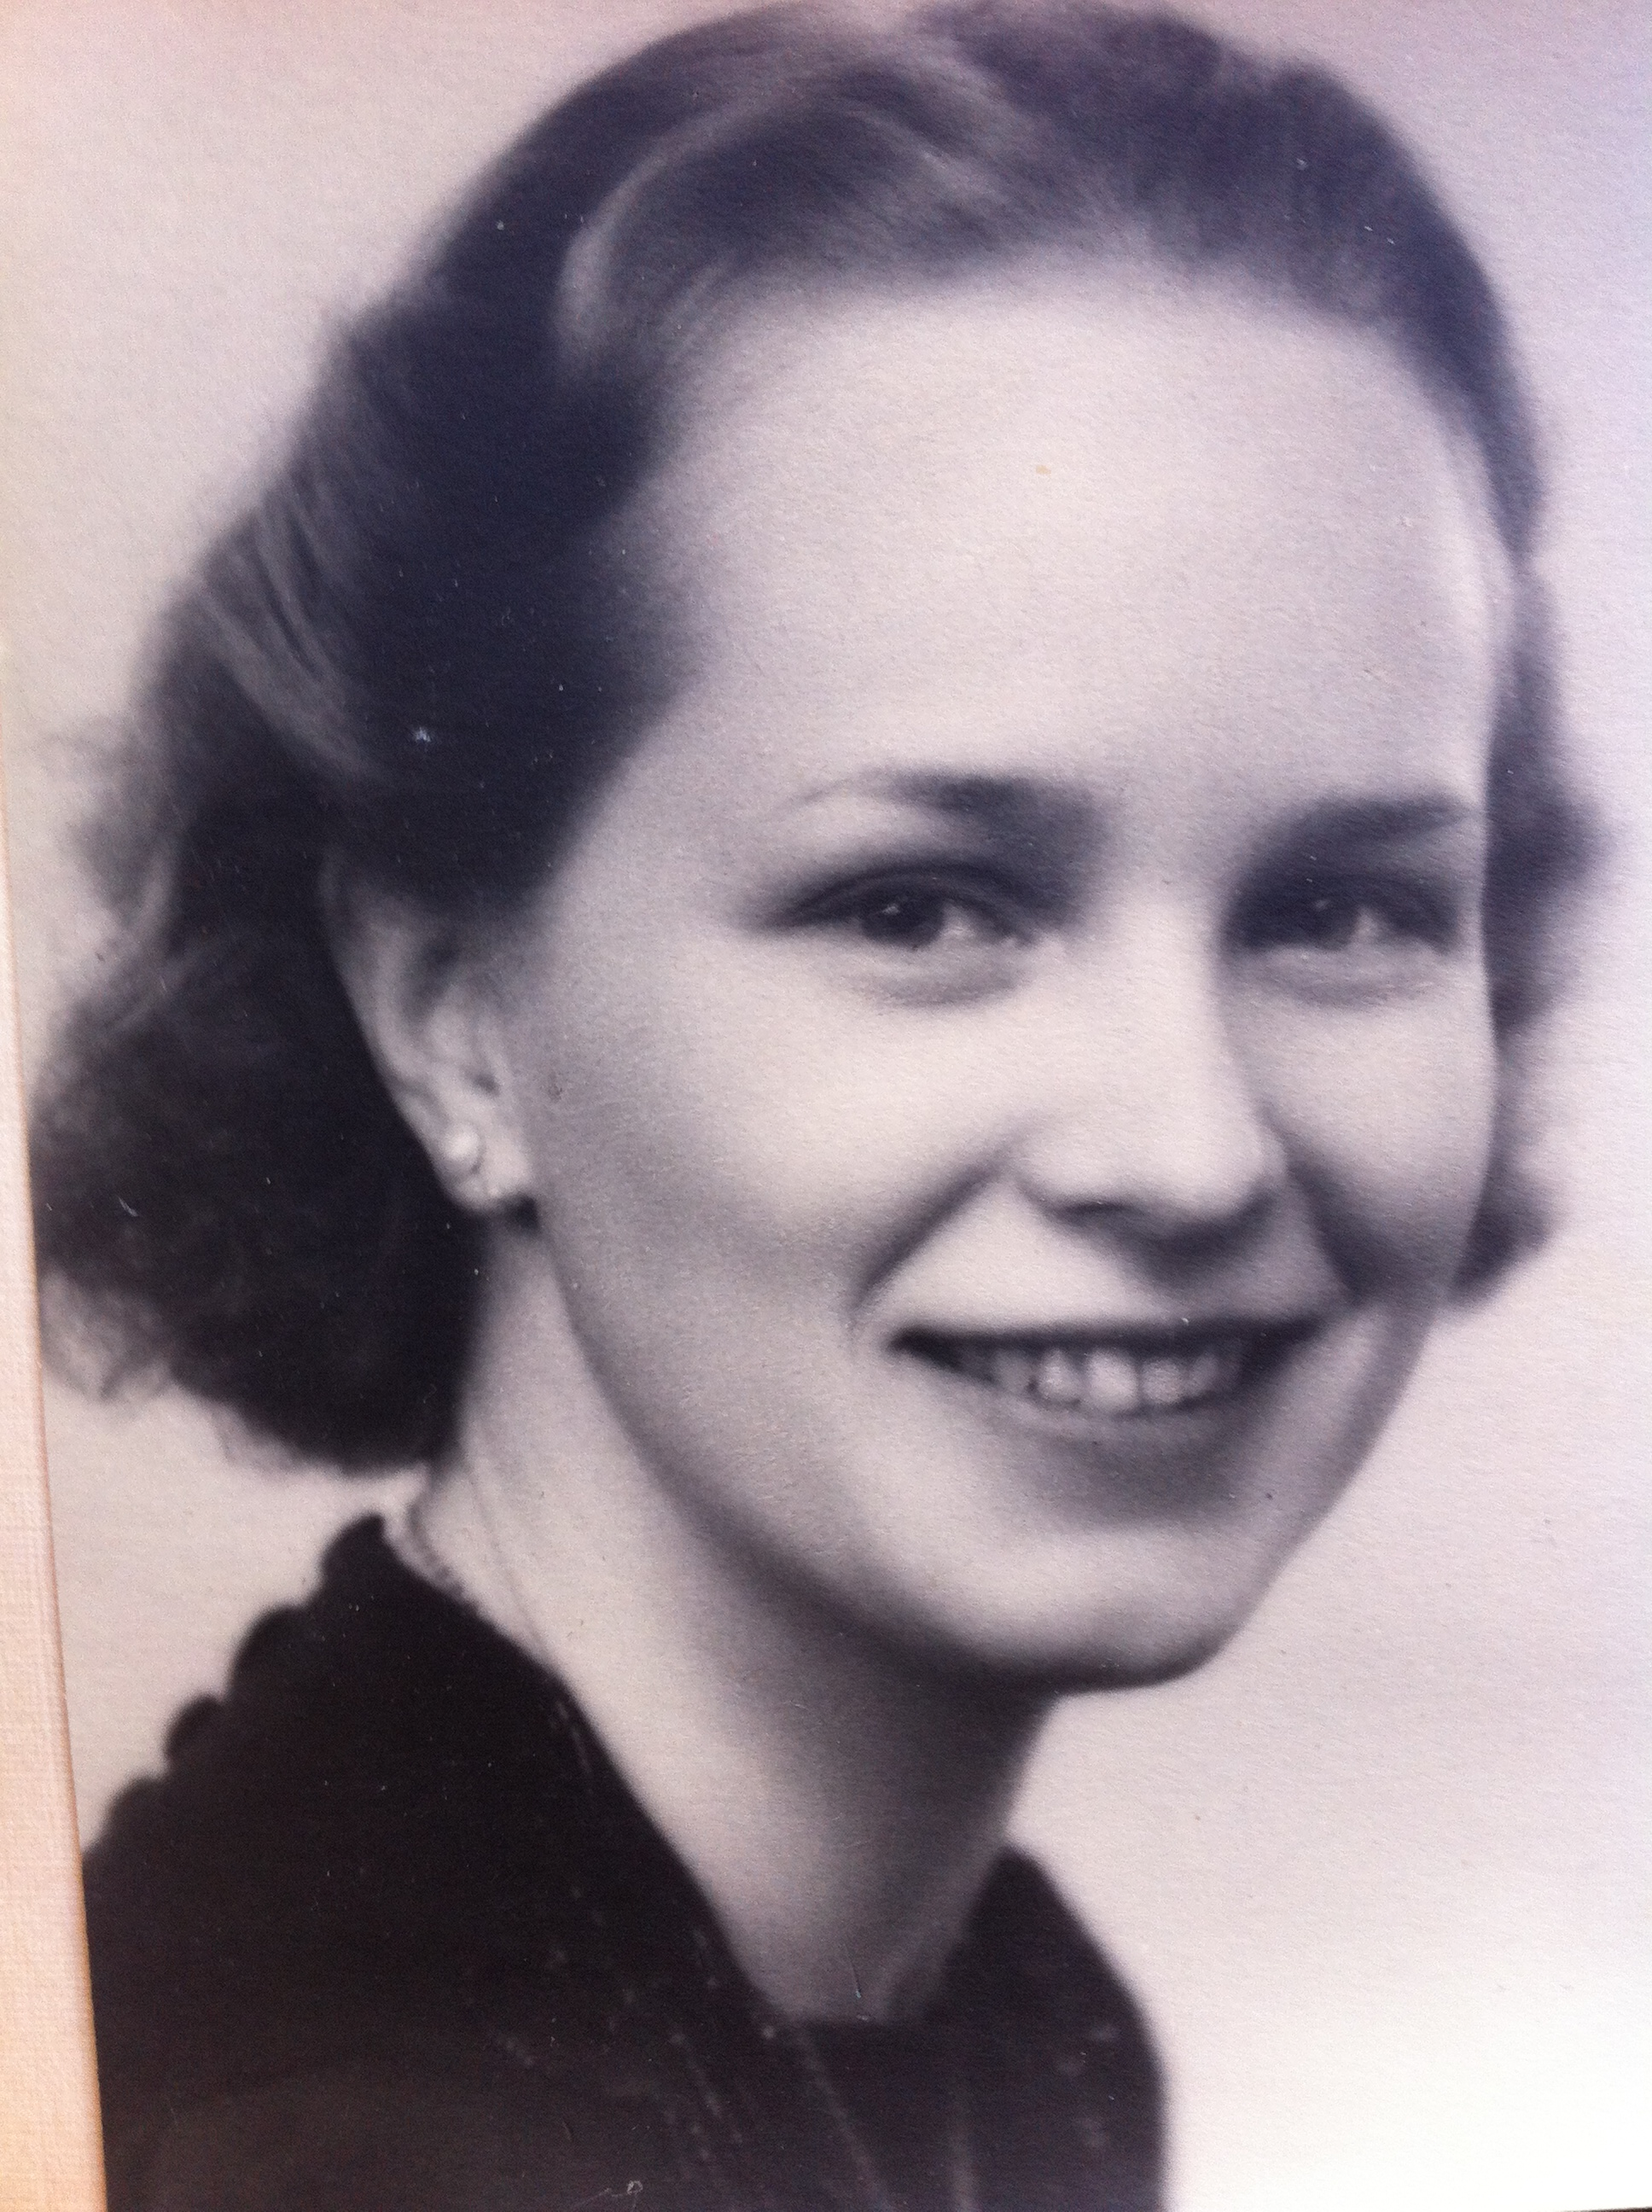 Walter Ljungquist-beundraren Claire Neuman, 19 år